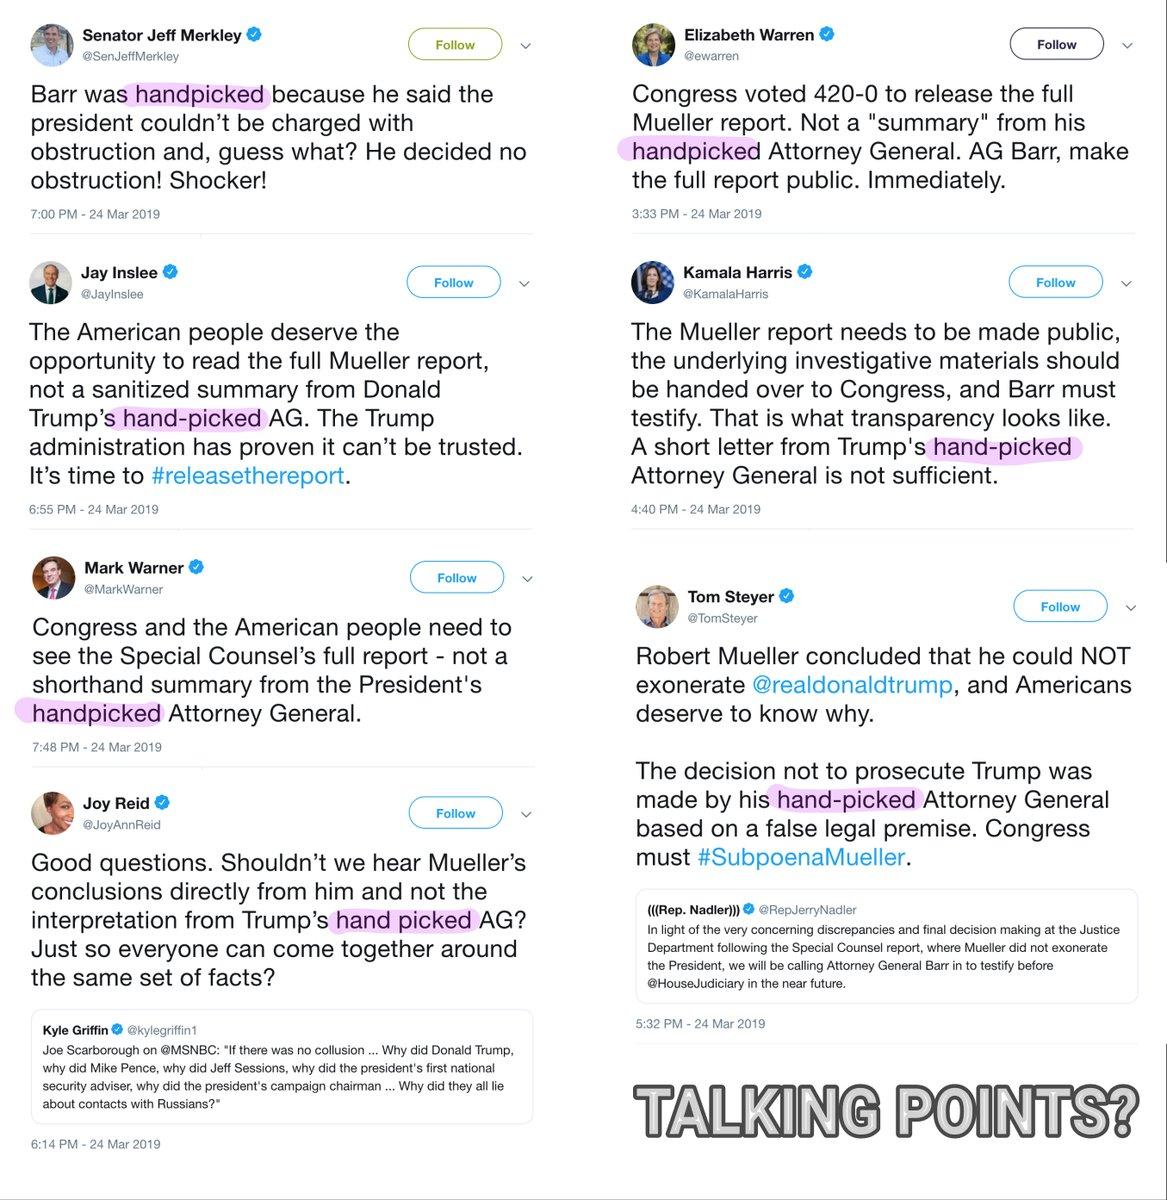 QAnon March 25 2019 - Talking Points?